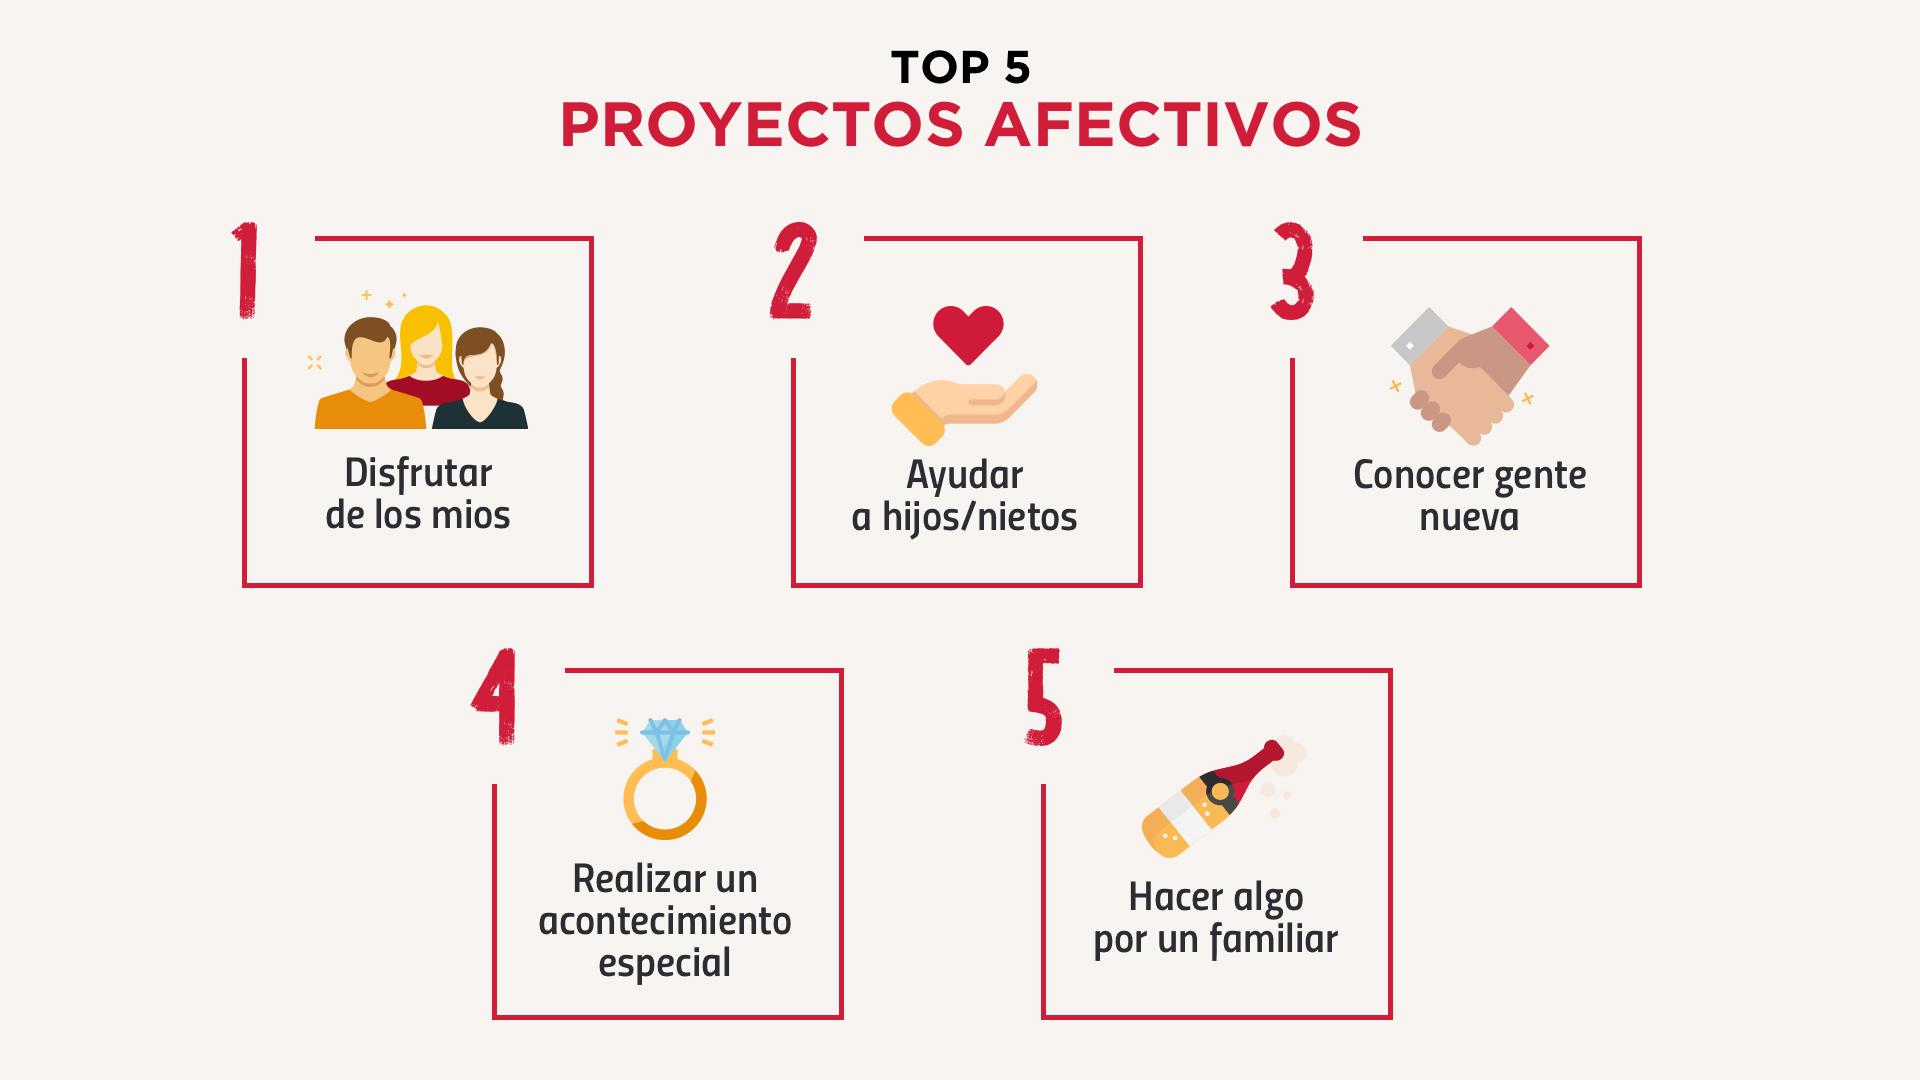 TOP 5 PROYECTOS AFECTIVOS